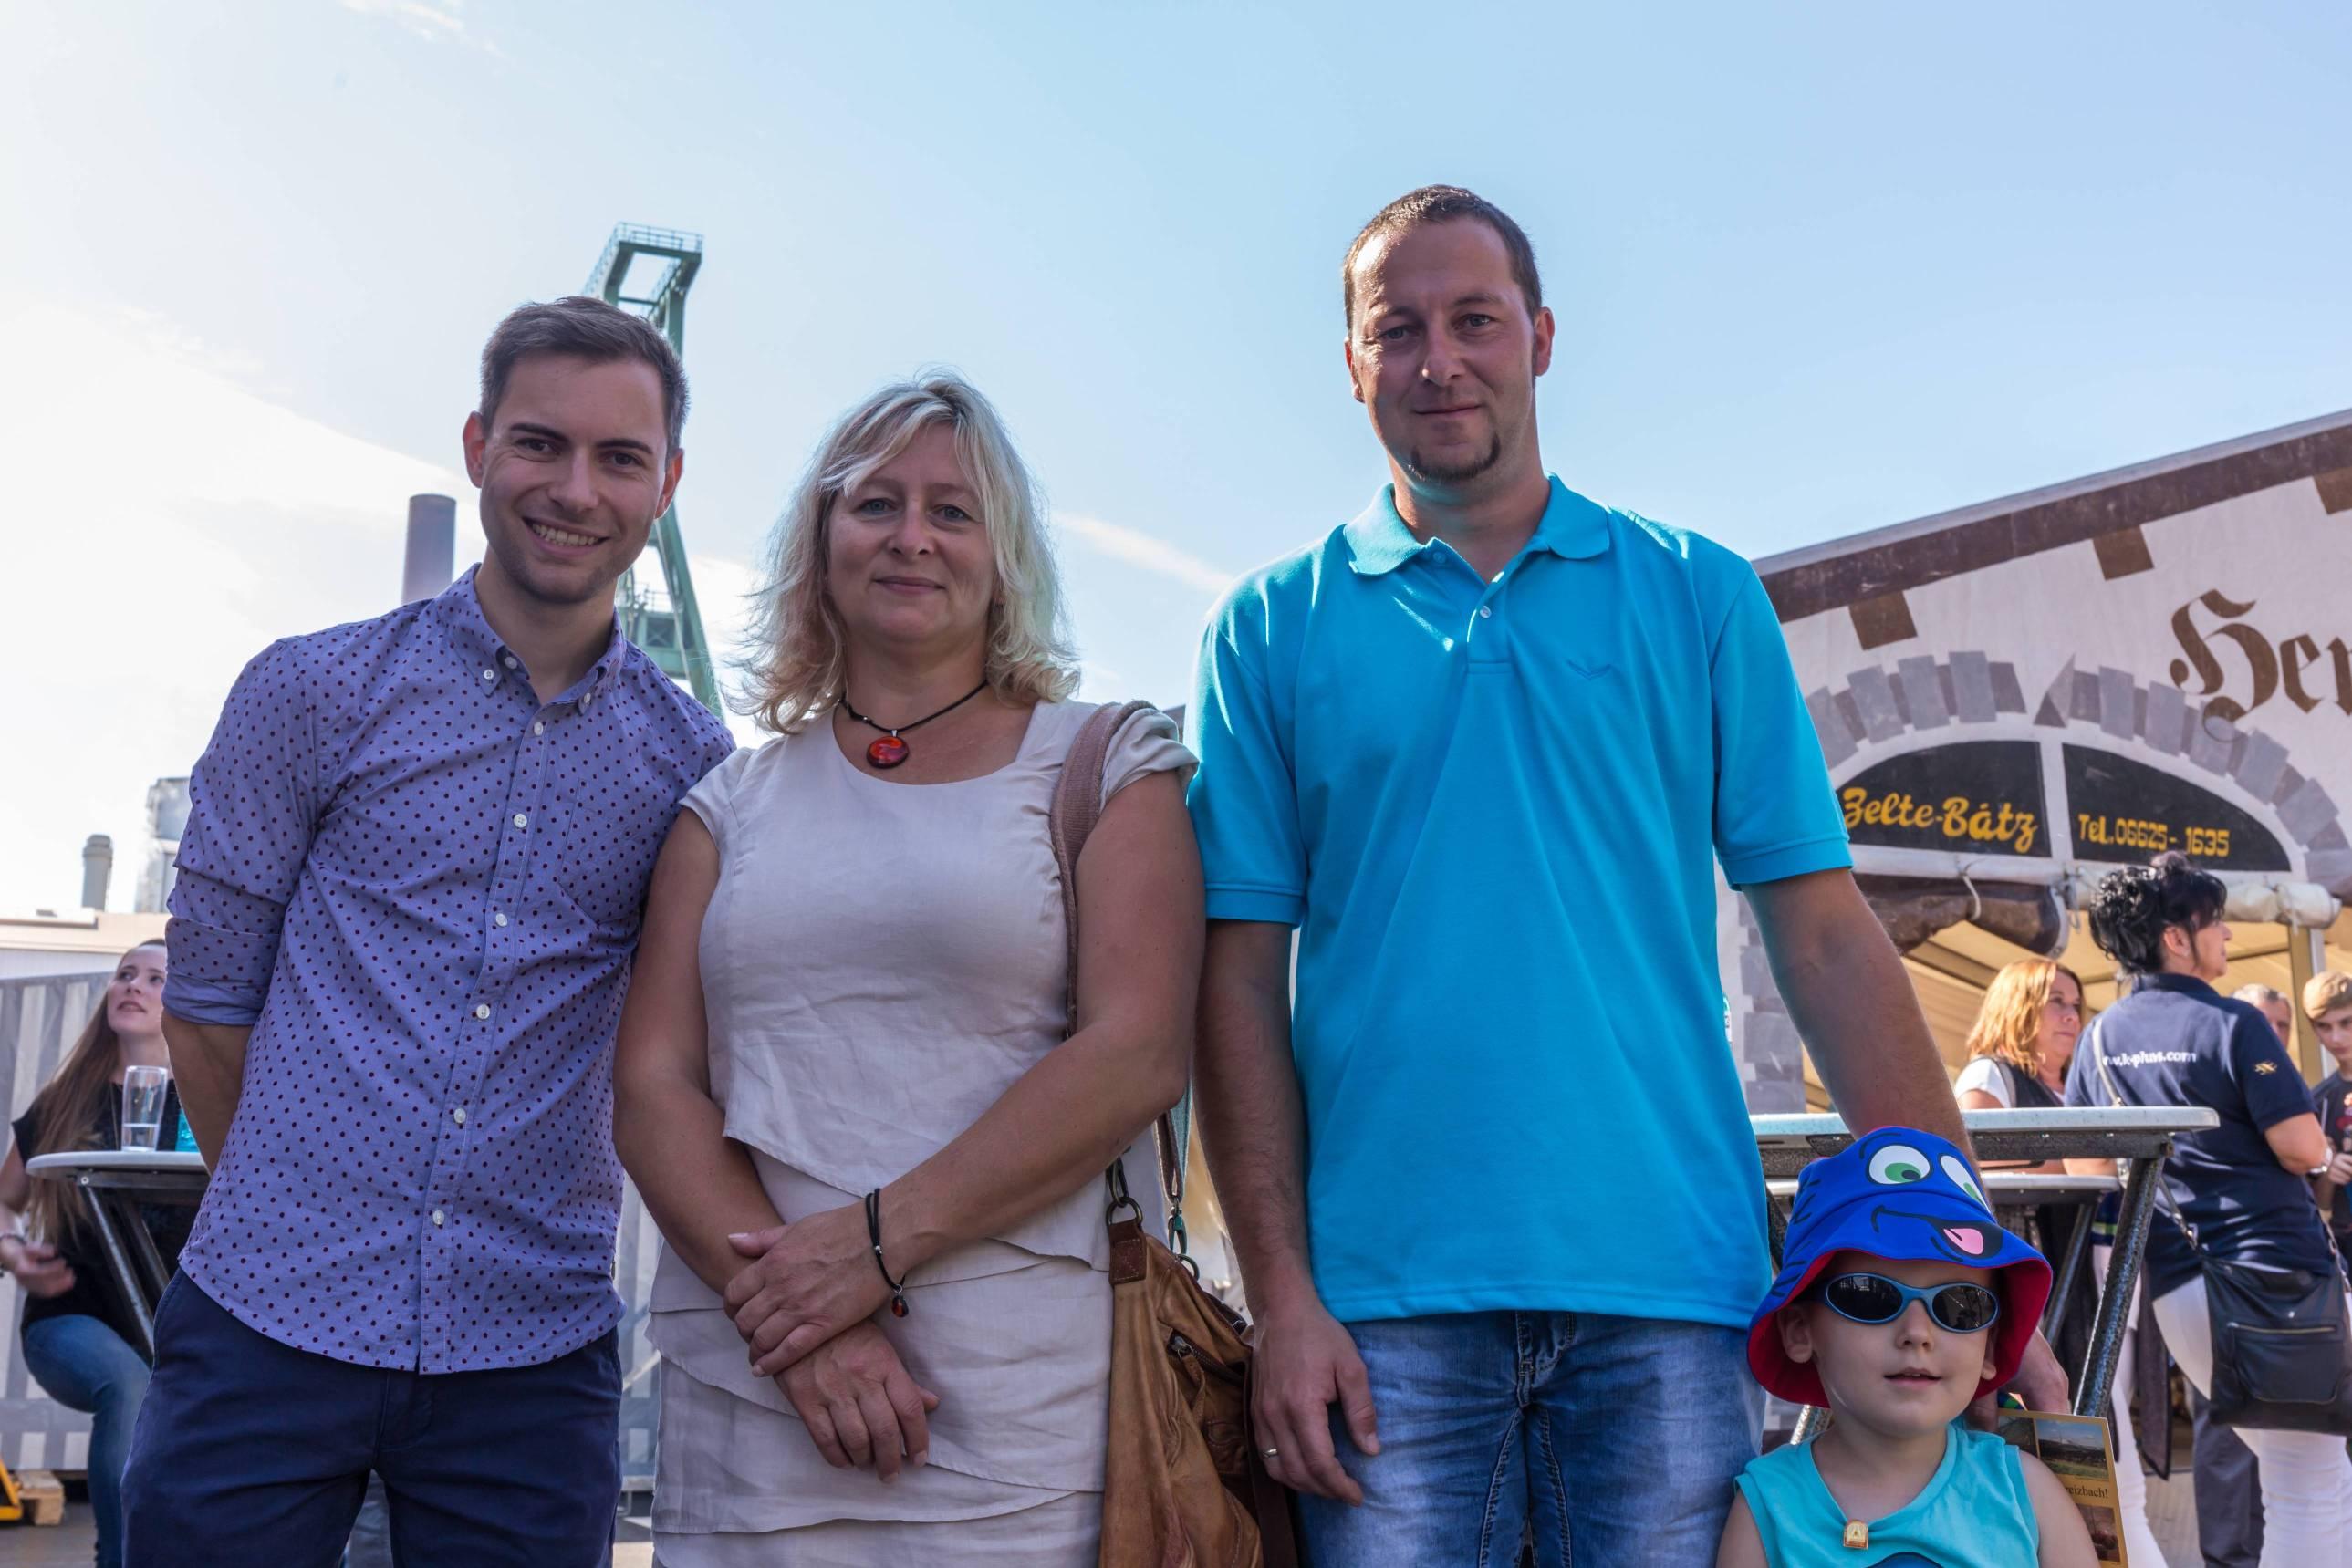 SPD Ortsverein Unterbeizbach (v.l.): Maik Klotzbach, Jeannette Jäger, Robert Beck